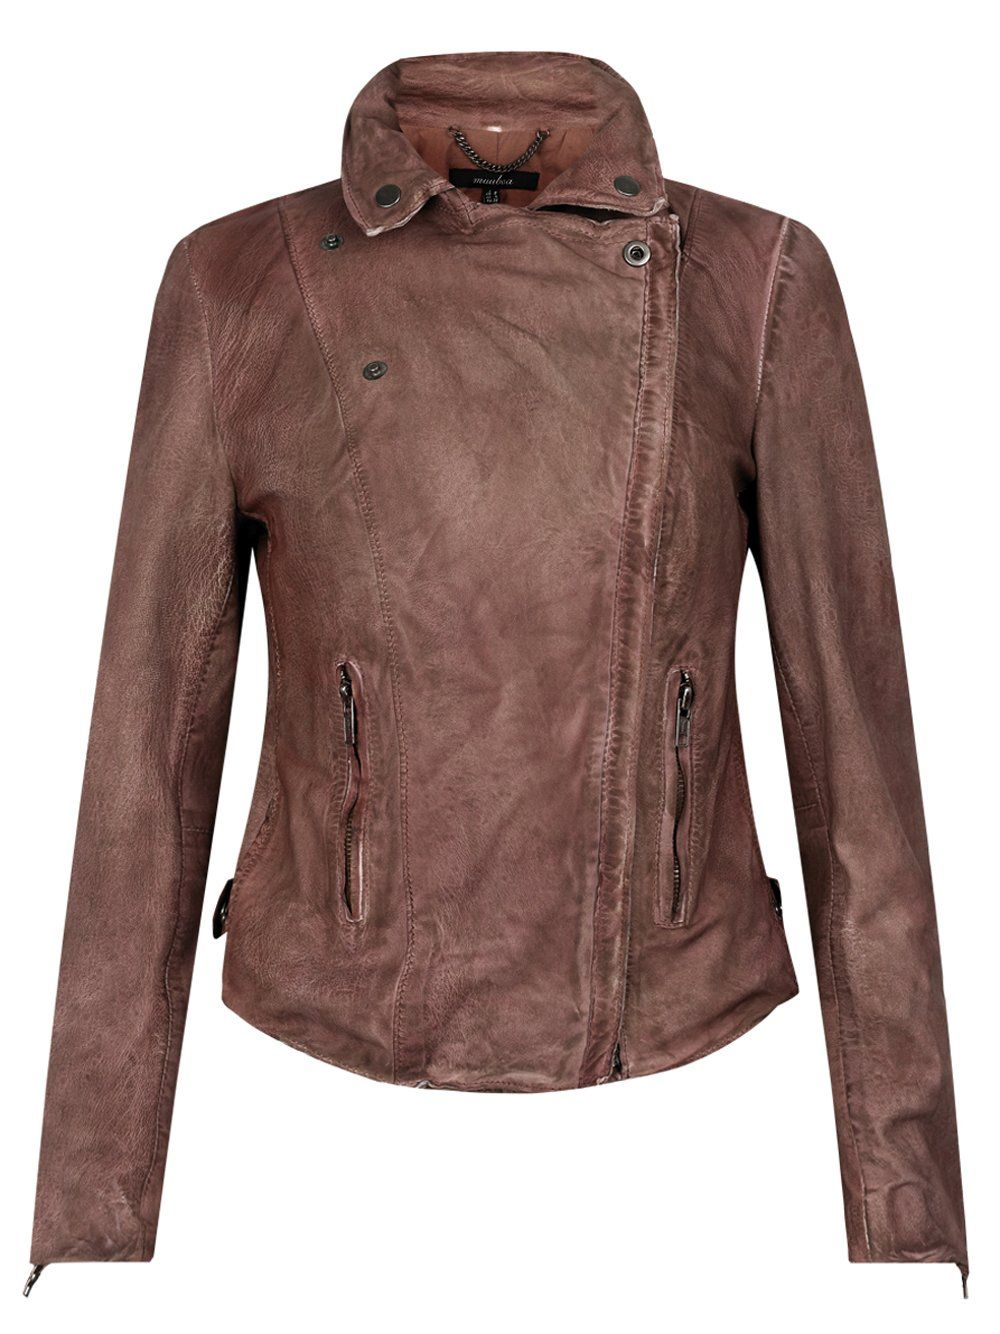 Monteria Leather Biker Jacket in Burnet | Hair Clothes